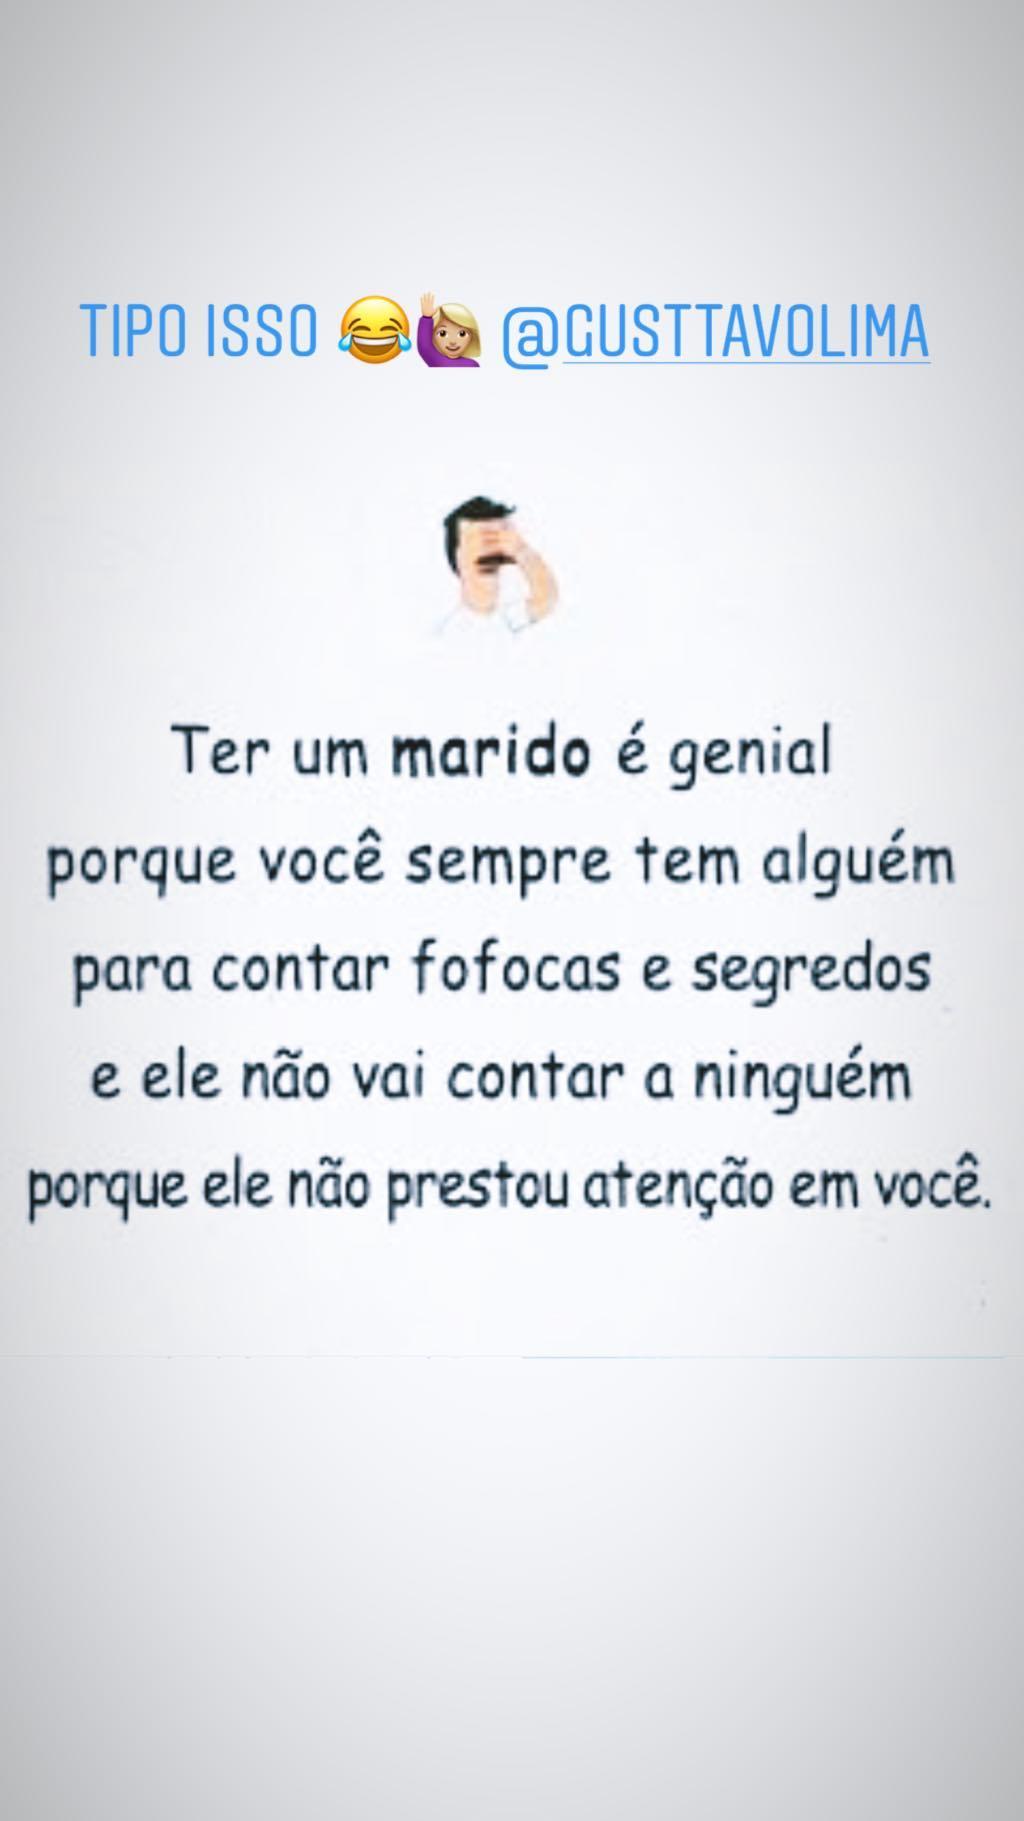 andressa-suita-manda-indireta-ao-marido